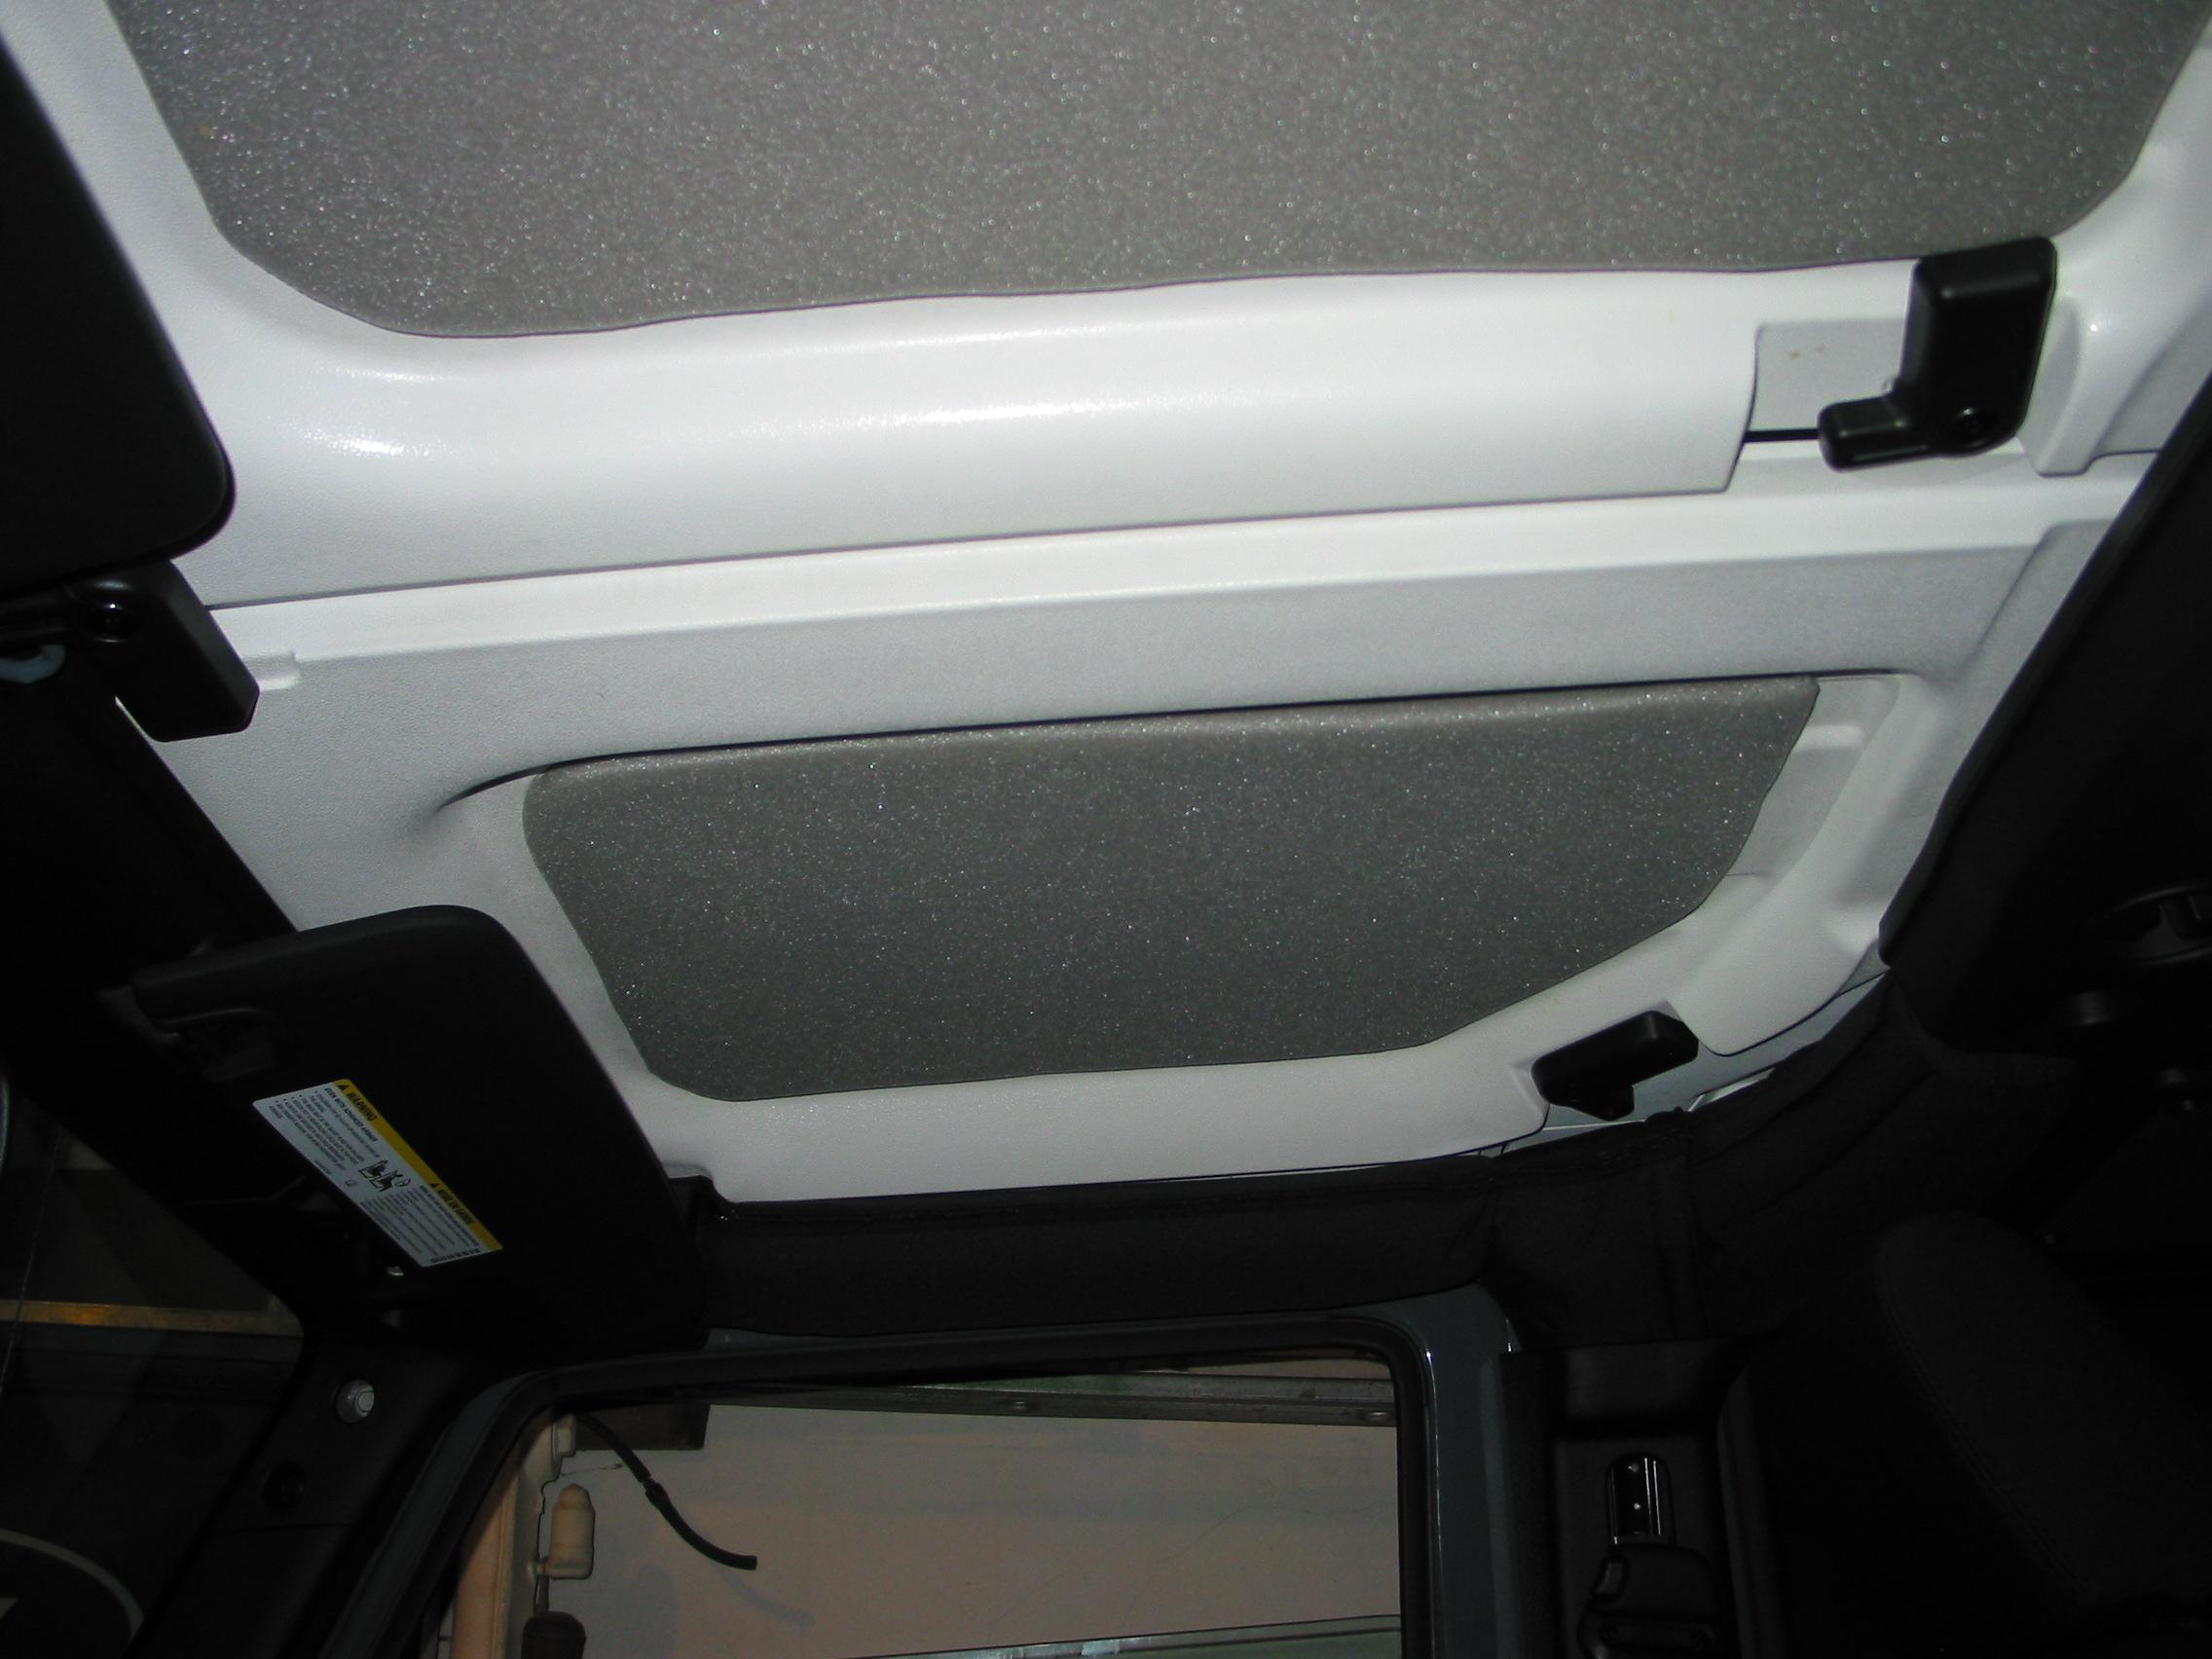 DIY JKU Roof Insulation Panels - JKowners com : Jeep